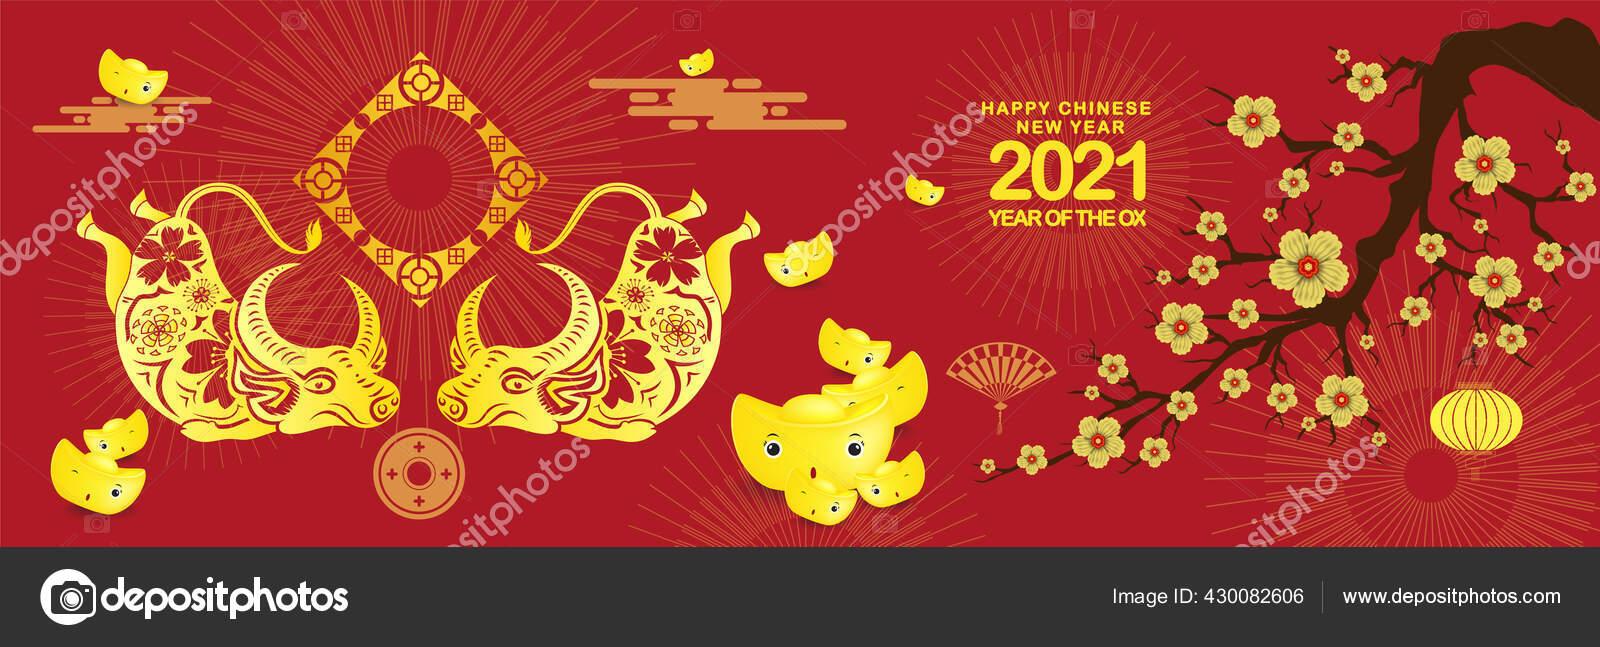 depositphotos_430082606-stock-illustration-happy-chinese-new-year-2021